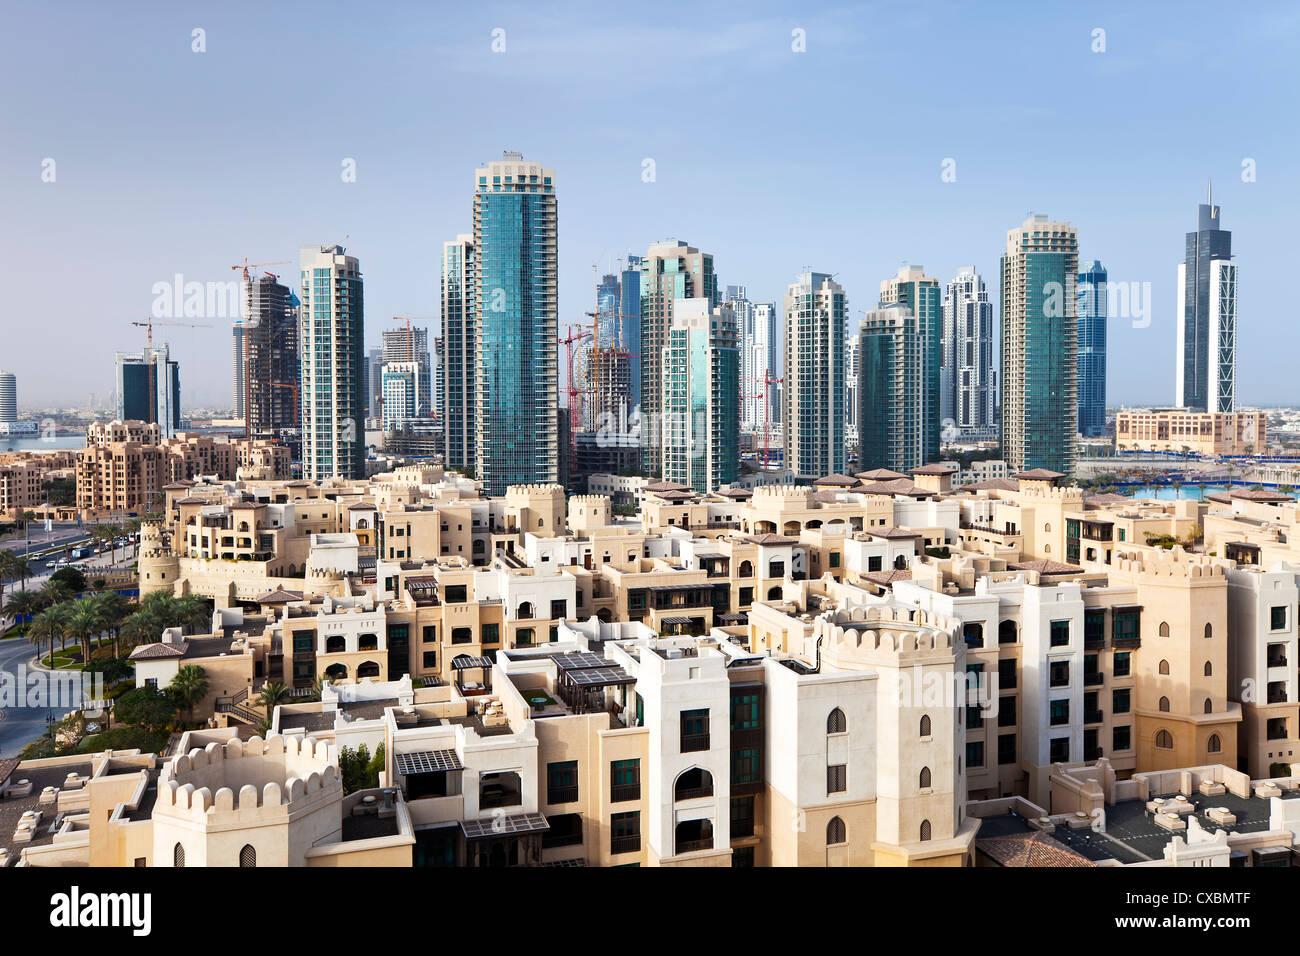 City skyline, elevated view over the Dubai Mall and Burj Khalifa Park, Dubai, United Arab Emirates, Middle East - Stock Image